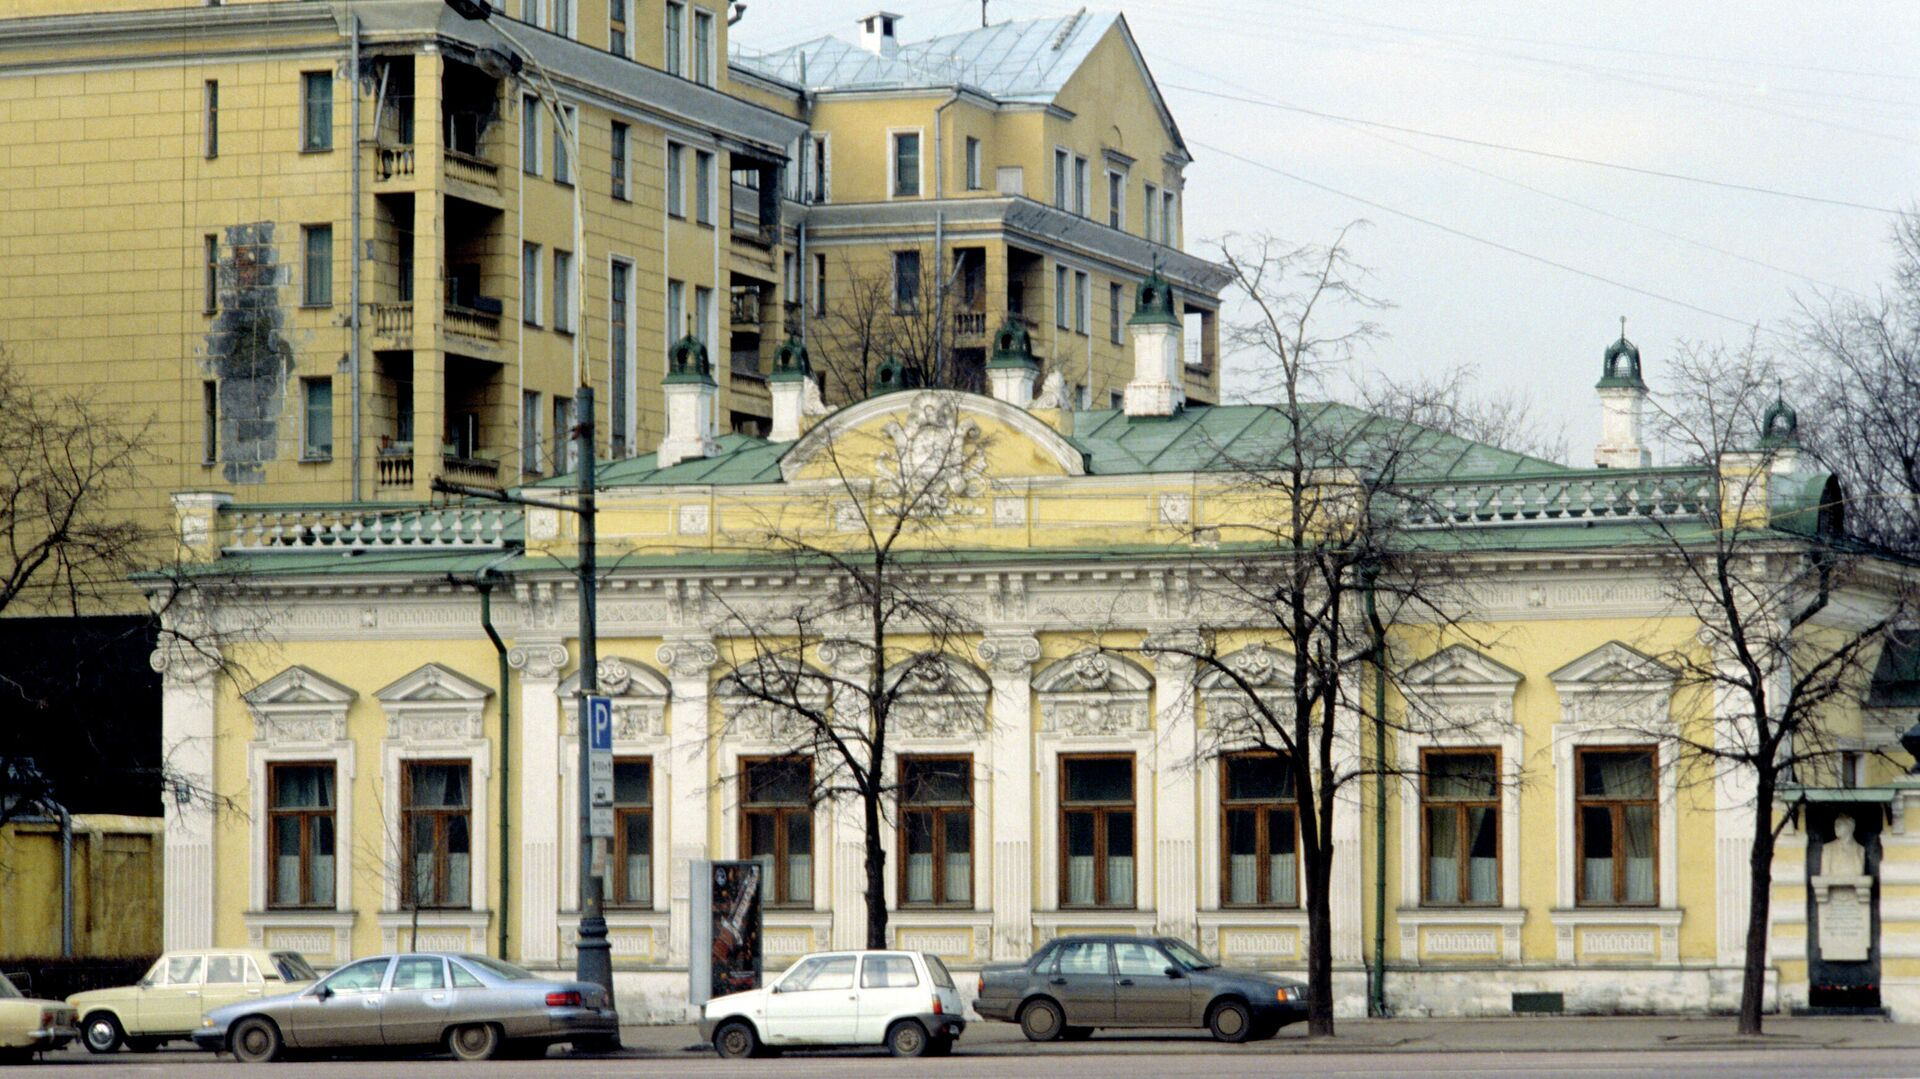 Особняк на Новинском бульваре - РИА Новости, 1920, 08.12.2020